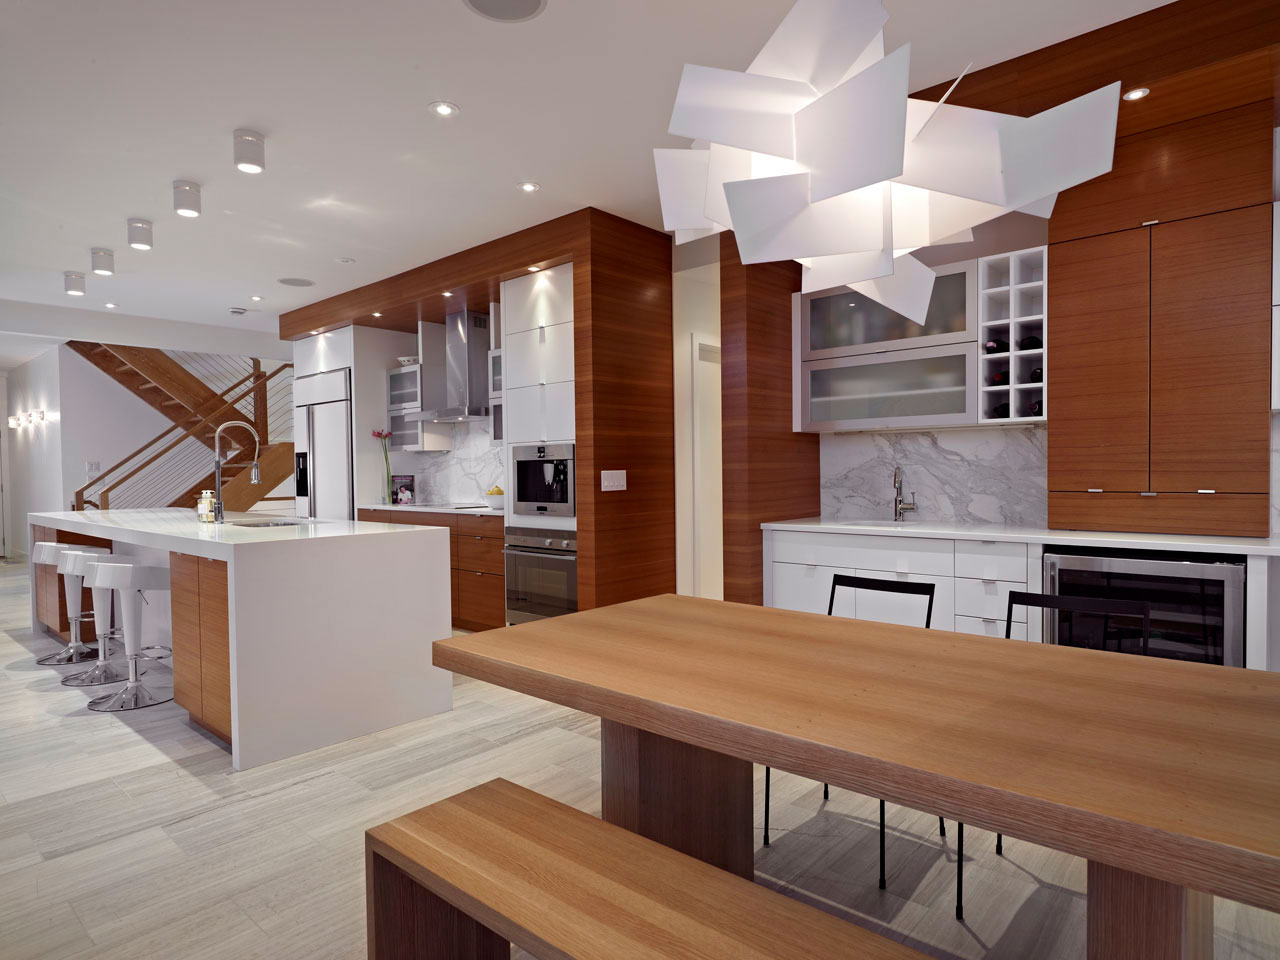 Breakfast Table, Lighting, Contemporary Home in Edmonton, Canada